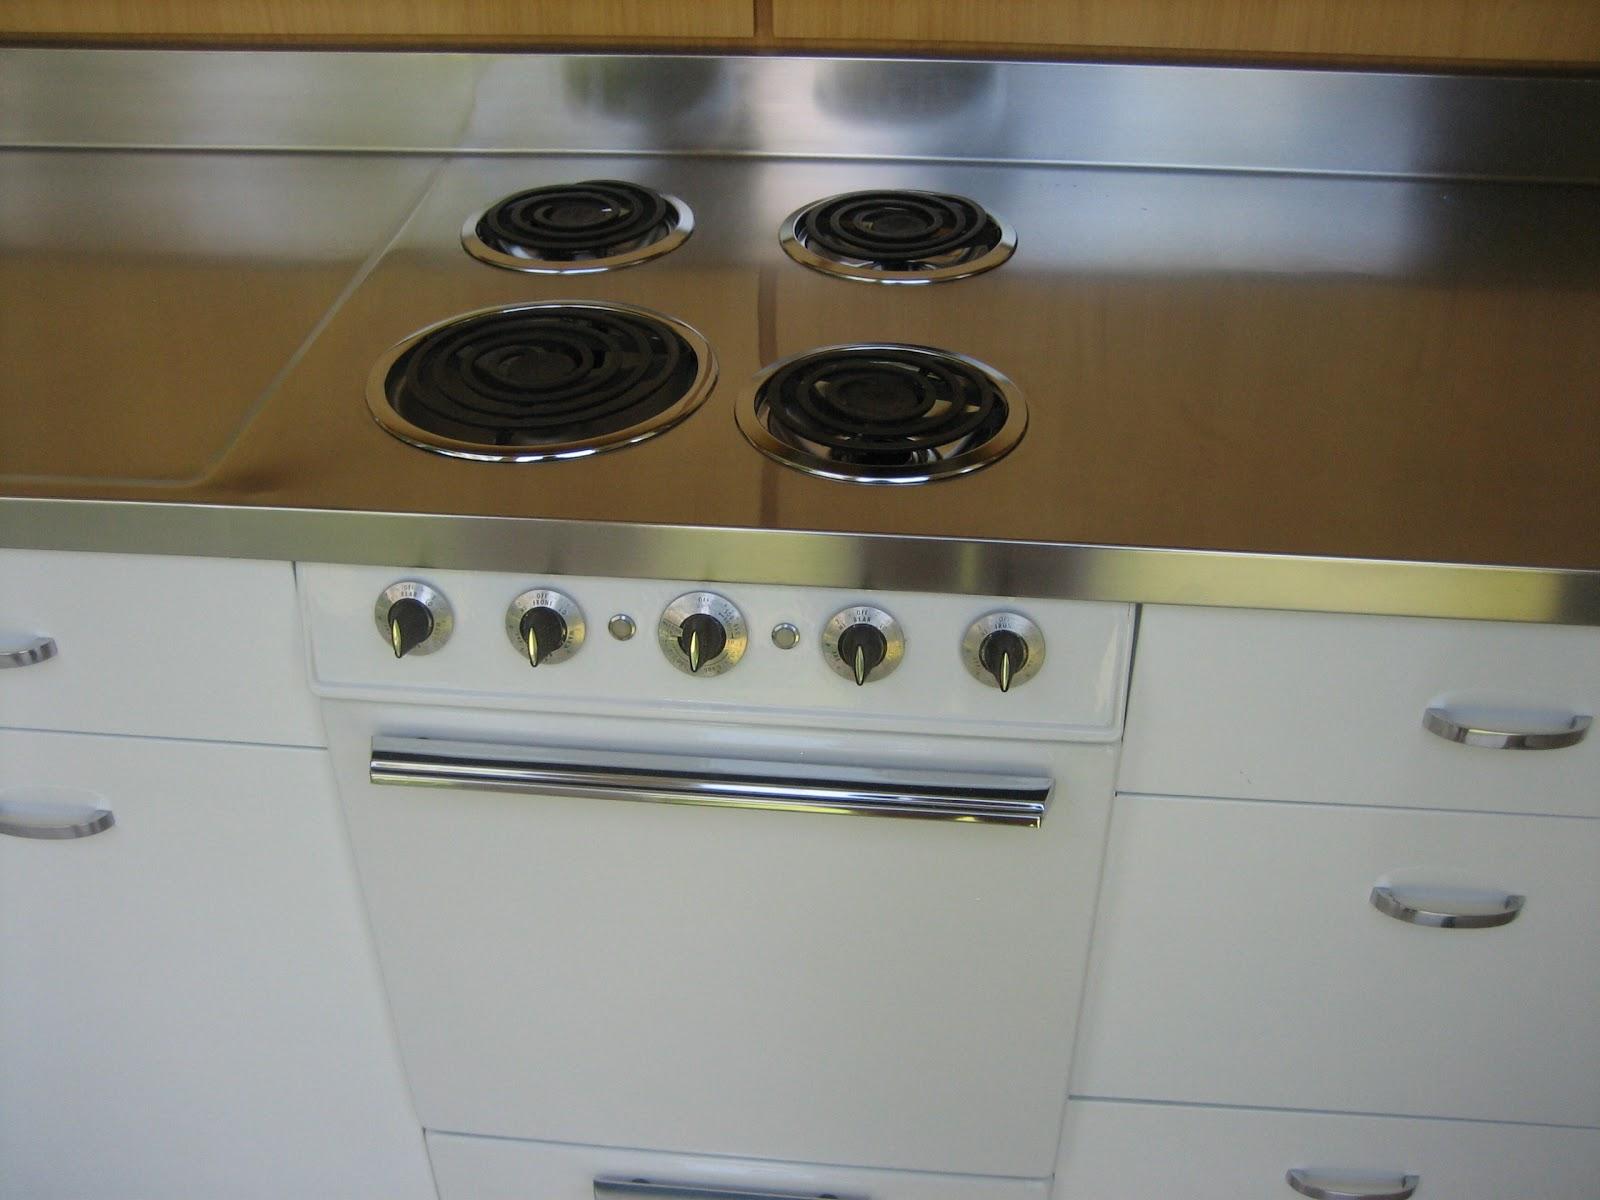 narrow kitchen countertops acrylic sinks the farnsworth house and innovation justkul